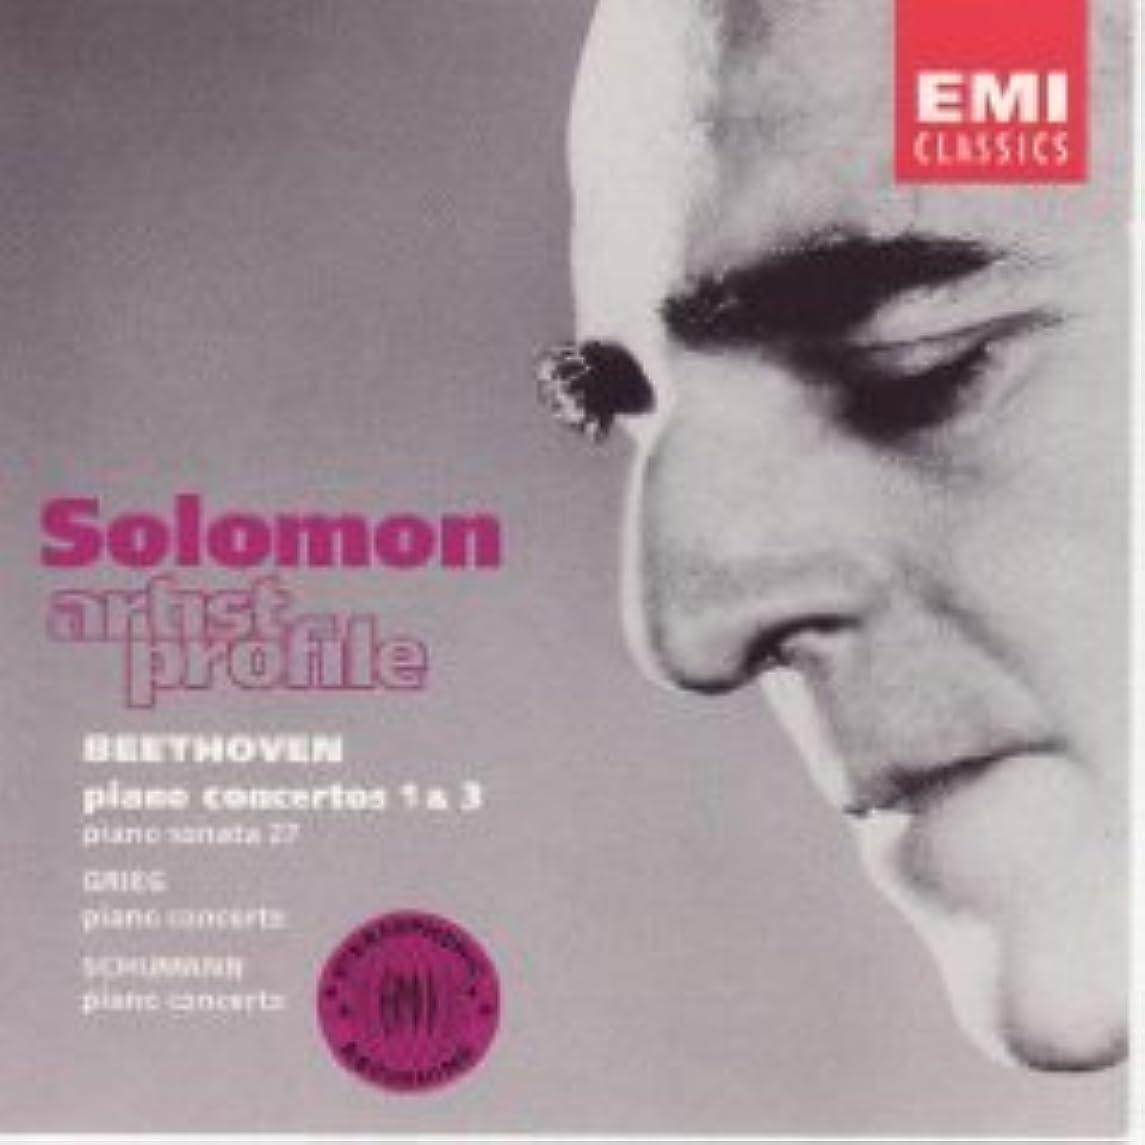 Artist Profile: Beethoven- Piano Concertos Nos. 1 & 3 / Piano Sonata, No. 27 / Grieg: Piano Concerto / Schumann: Piano Concerto